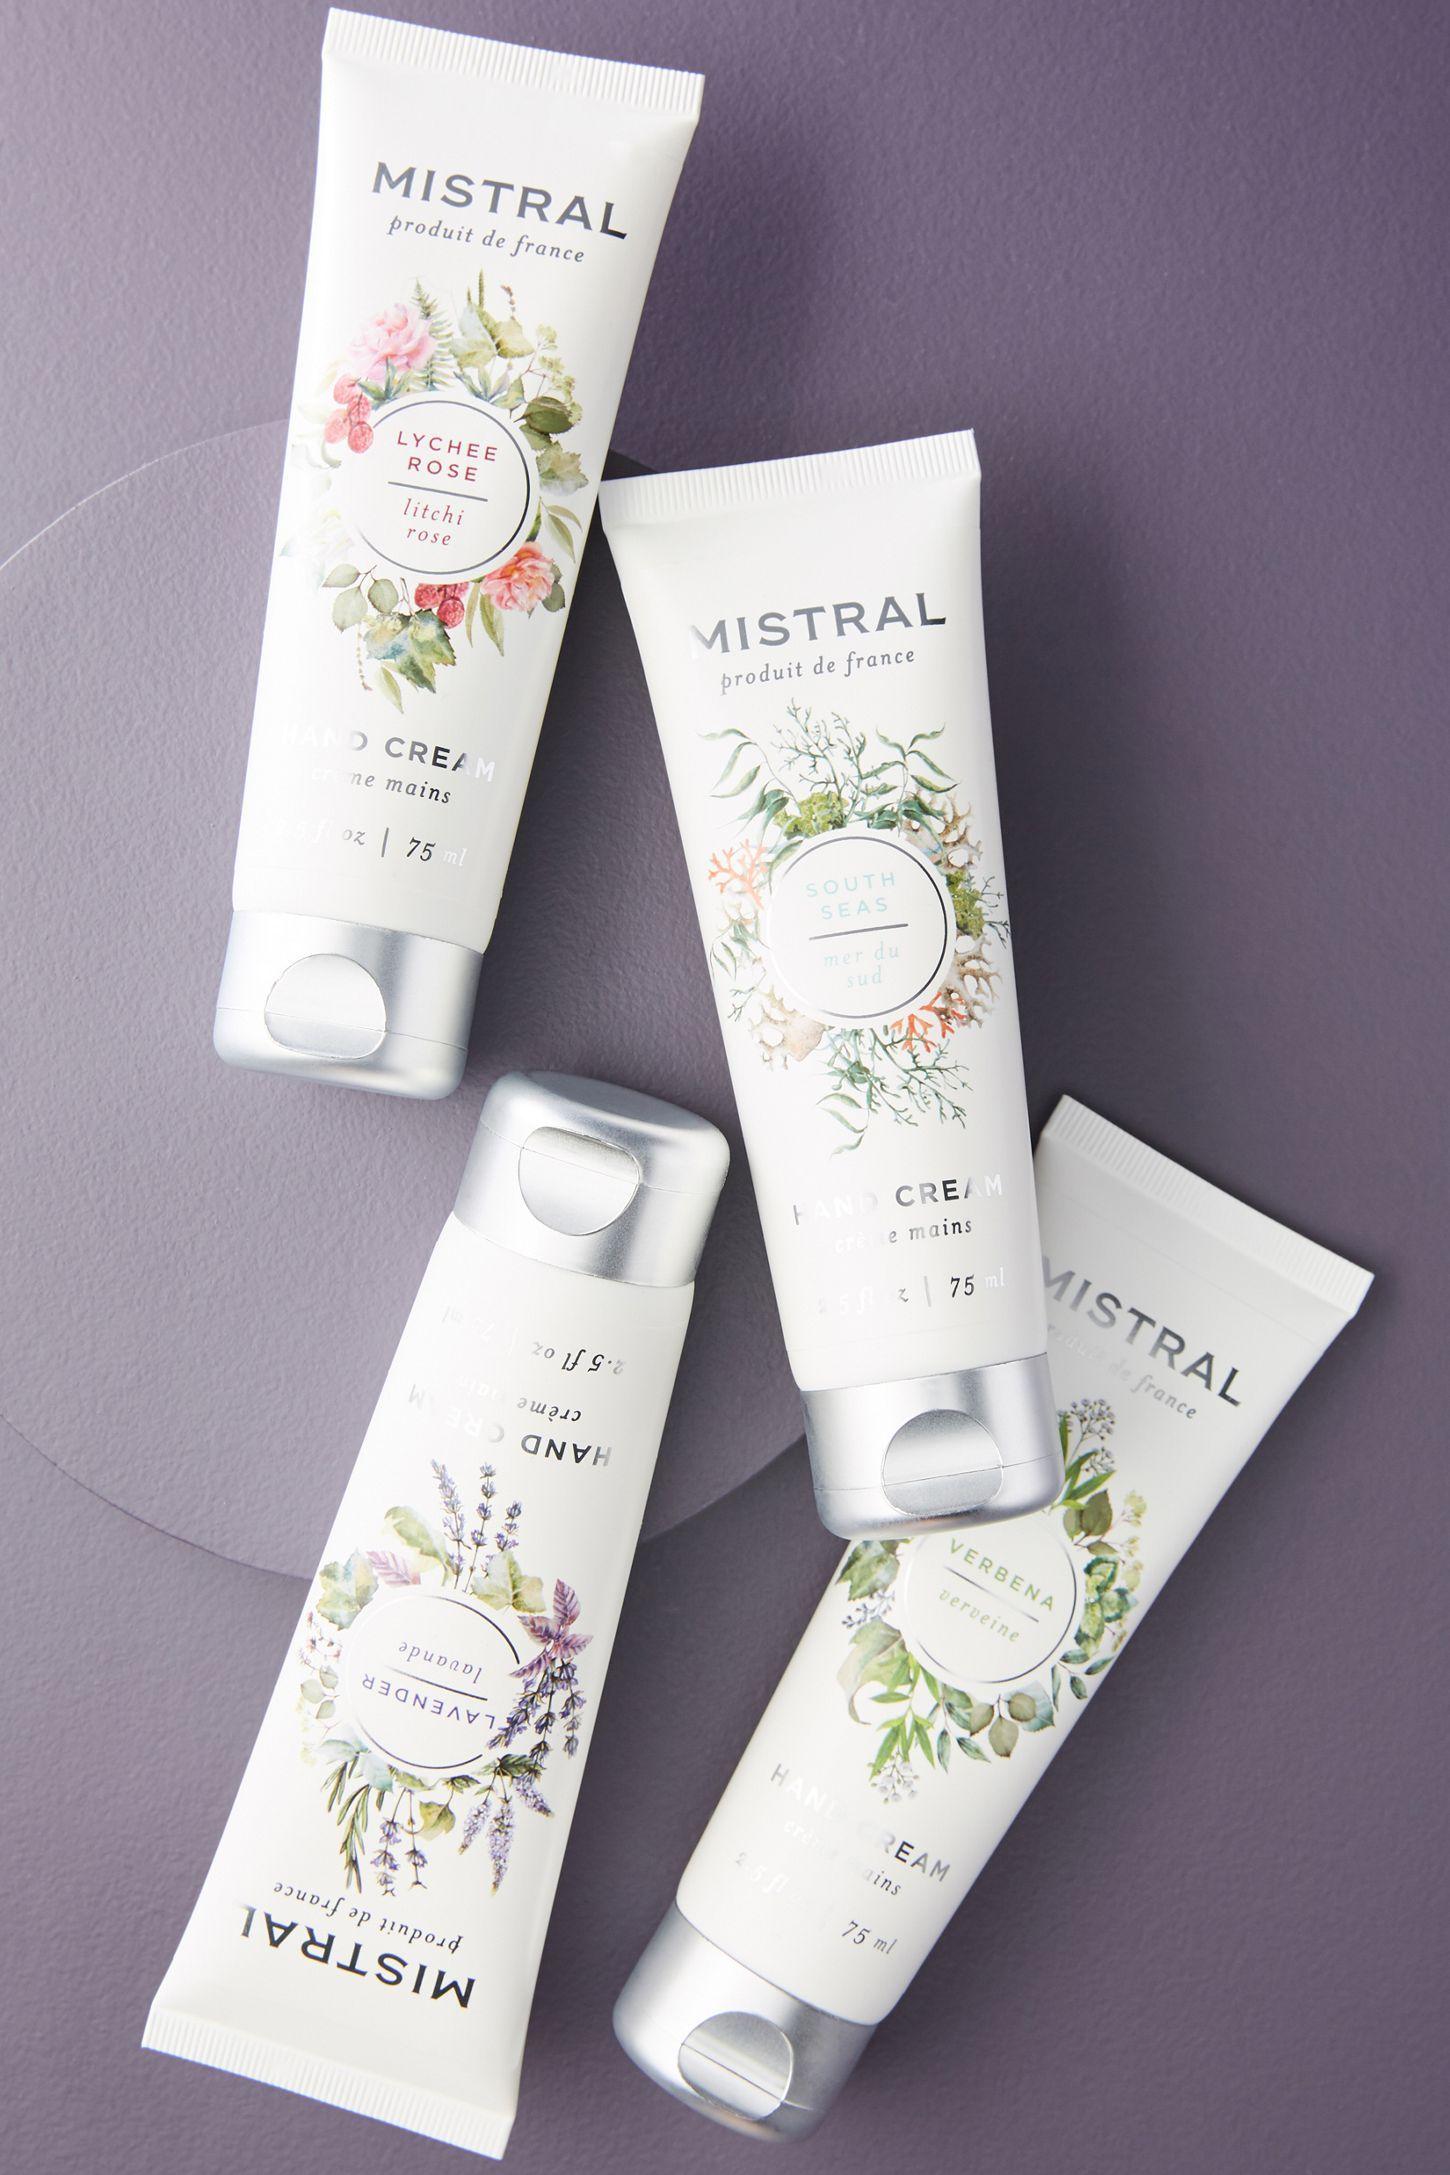 Mistral Classic Hand Cream in 2020 Hand cream, Cream